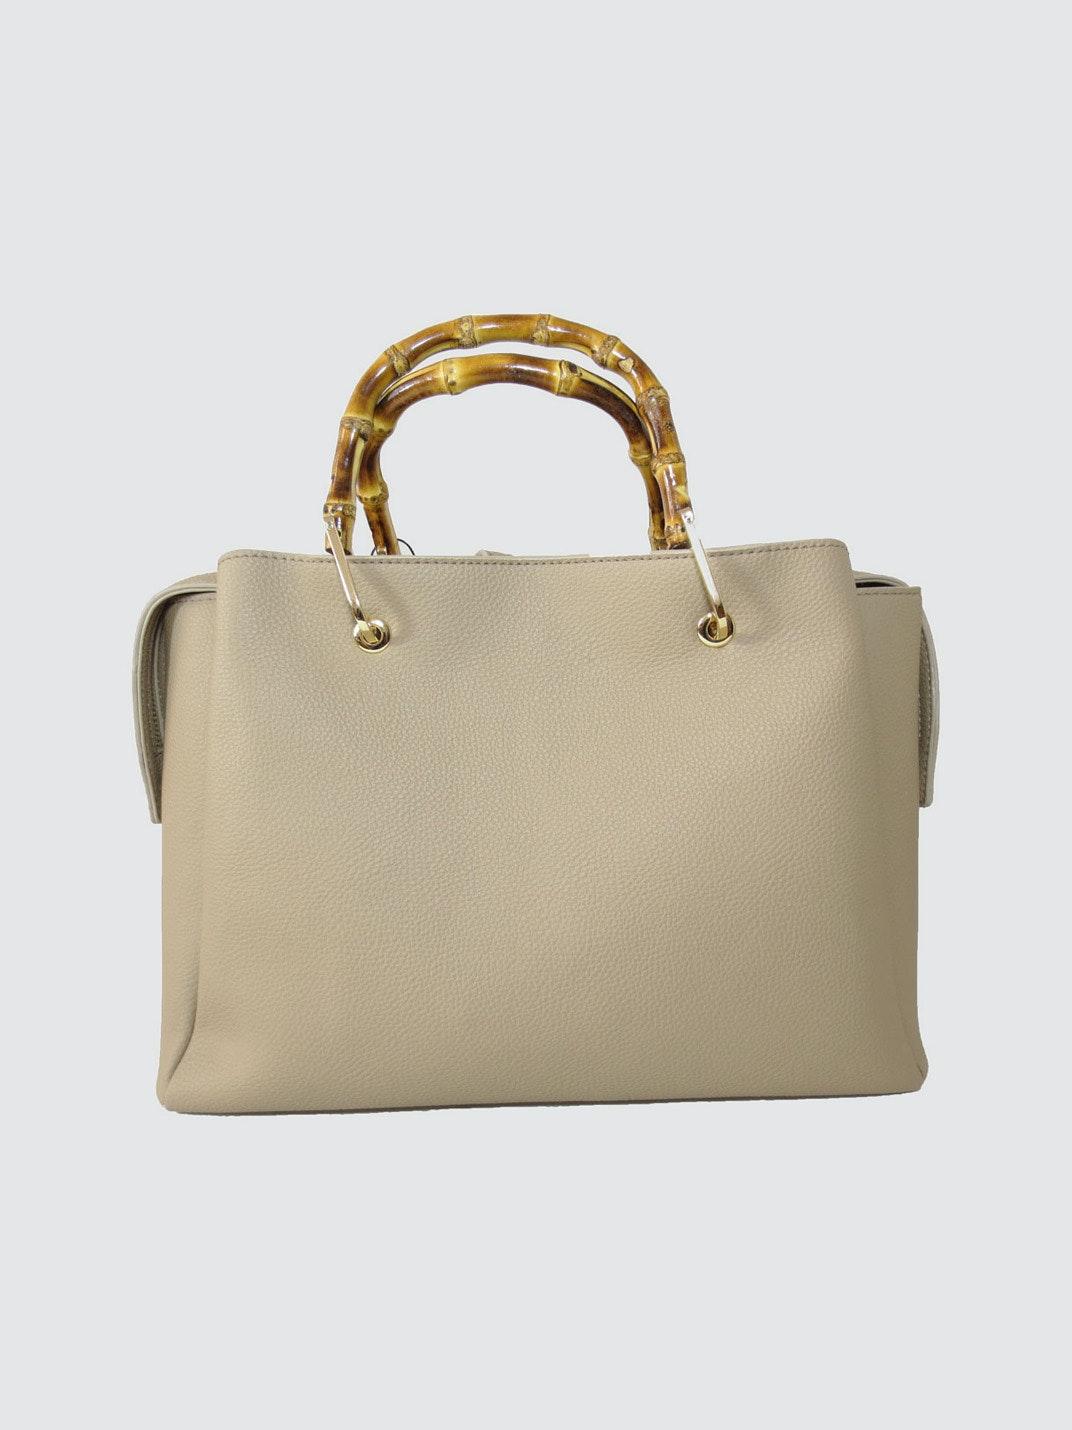 Verishop's Up To 80% Off Sale bag